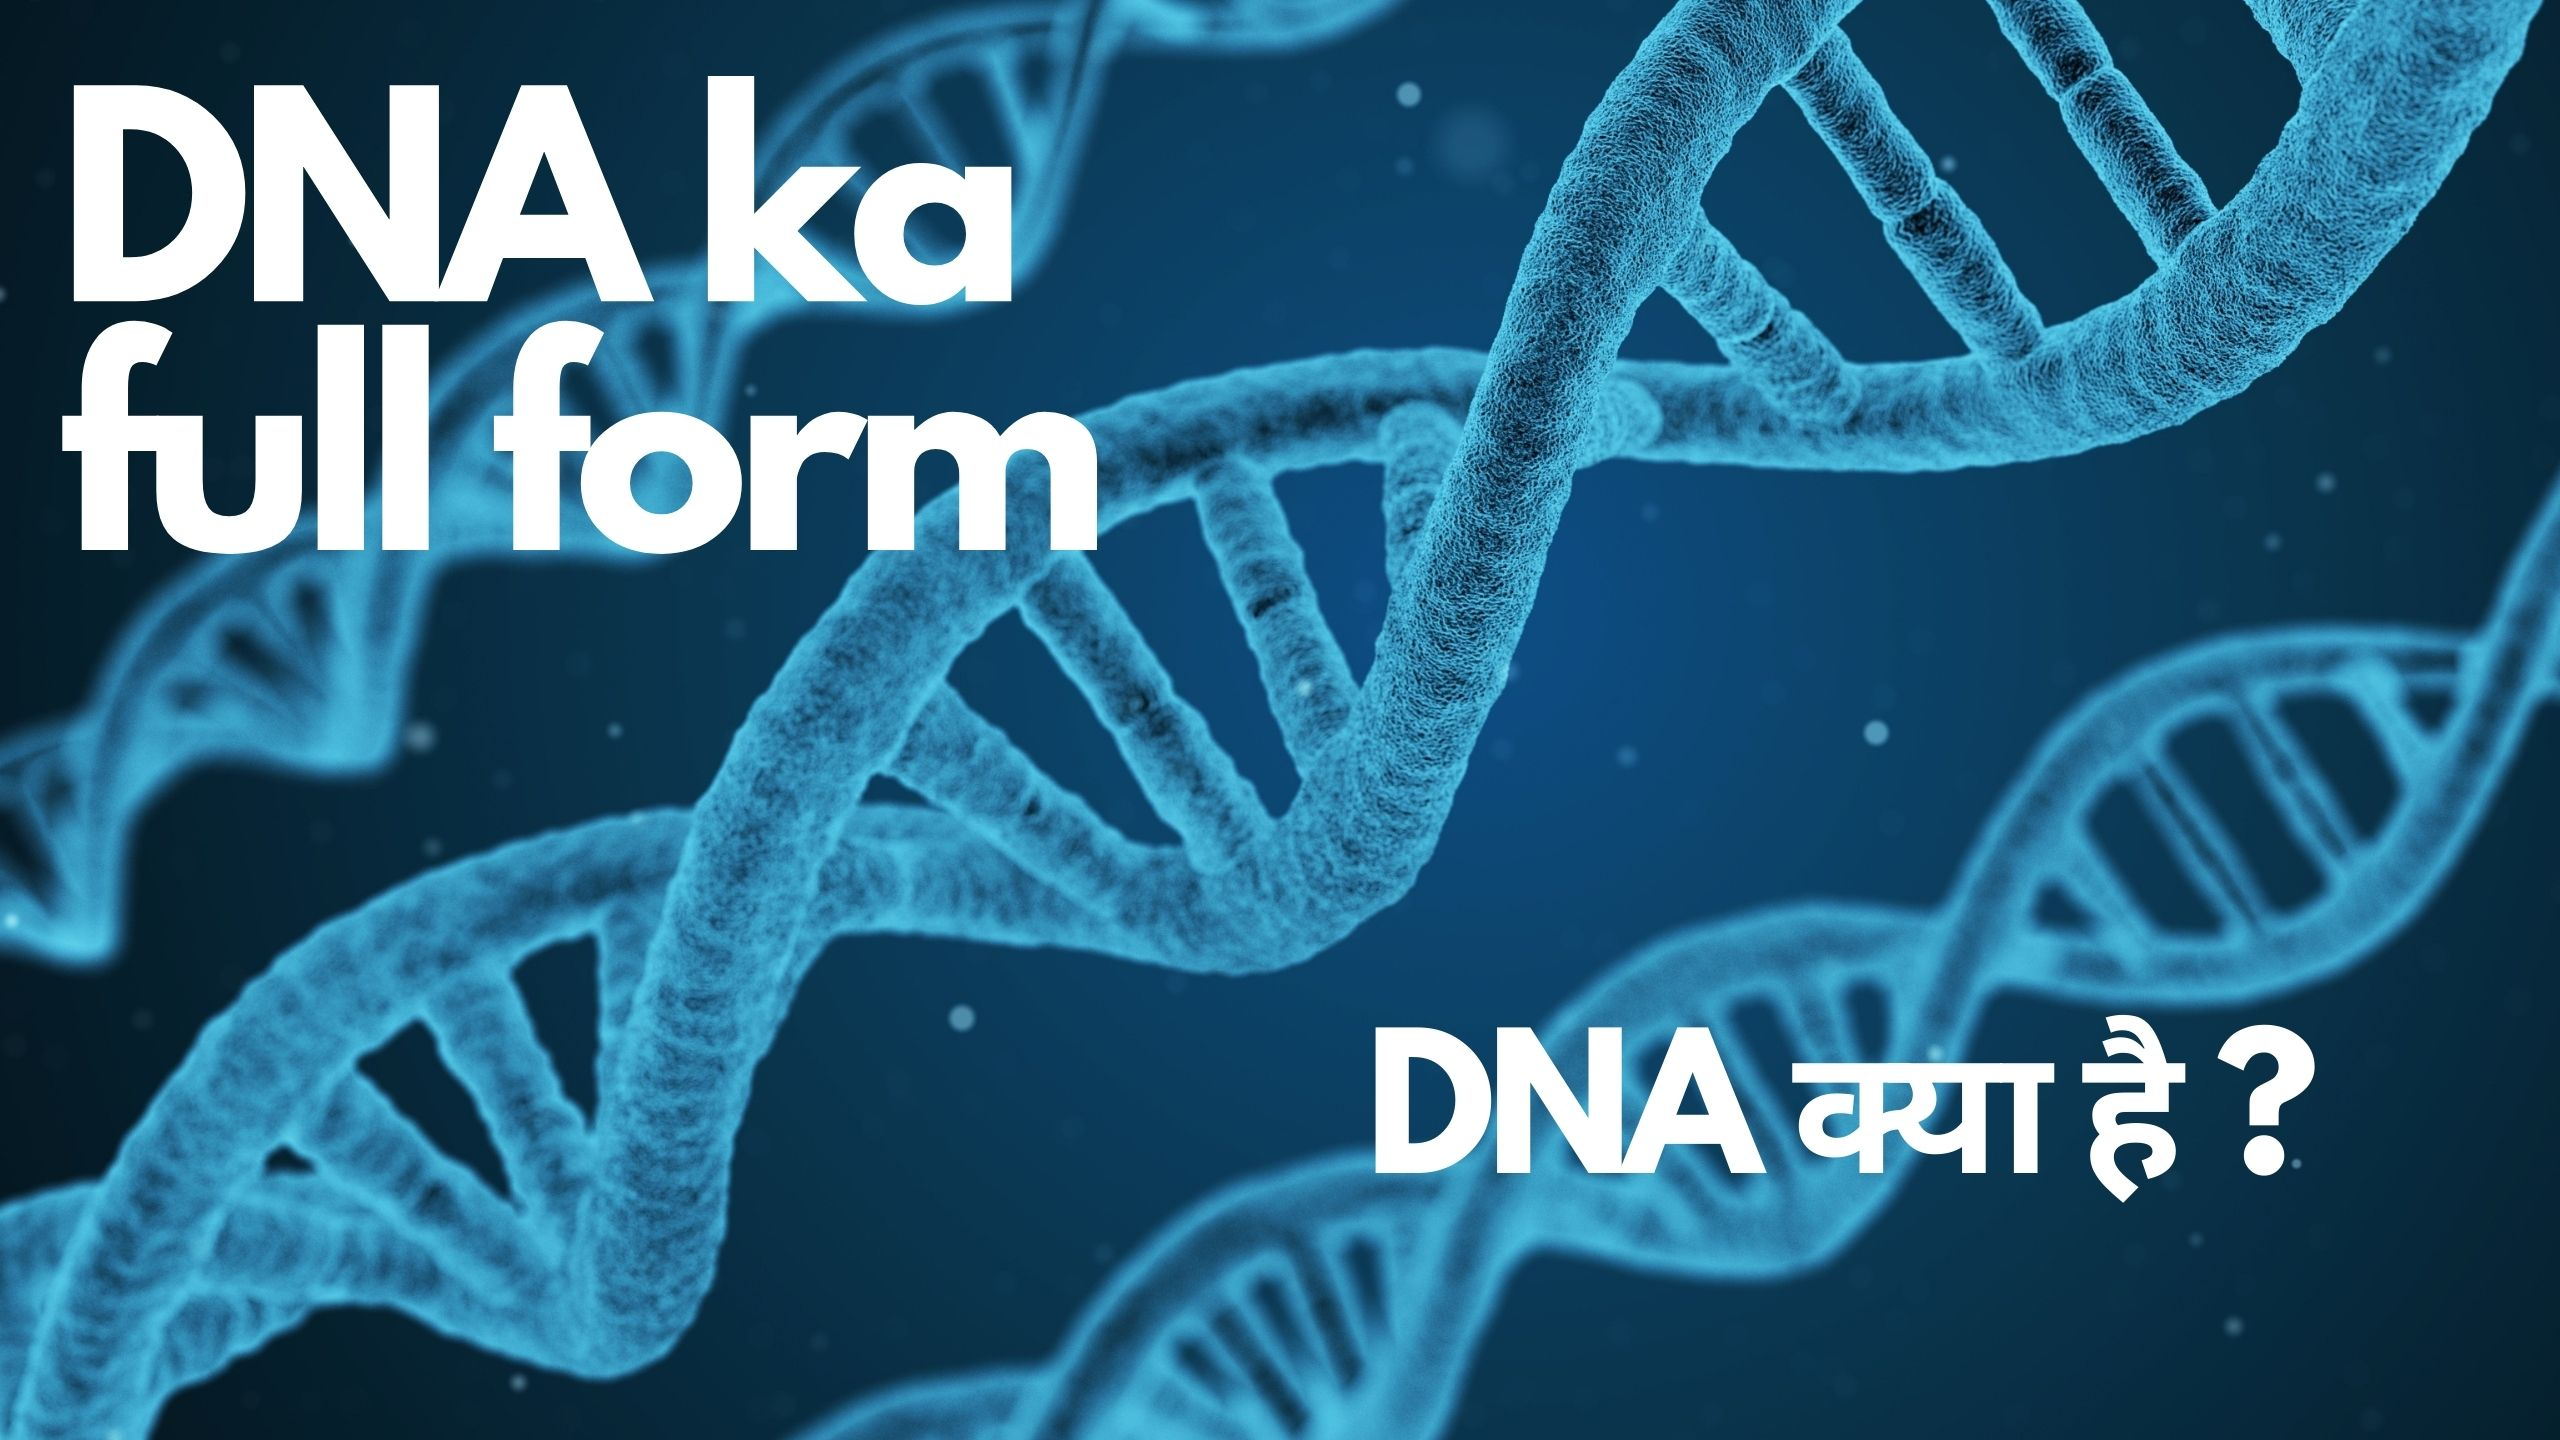 DNA ka full form - DNA full form in Hindi